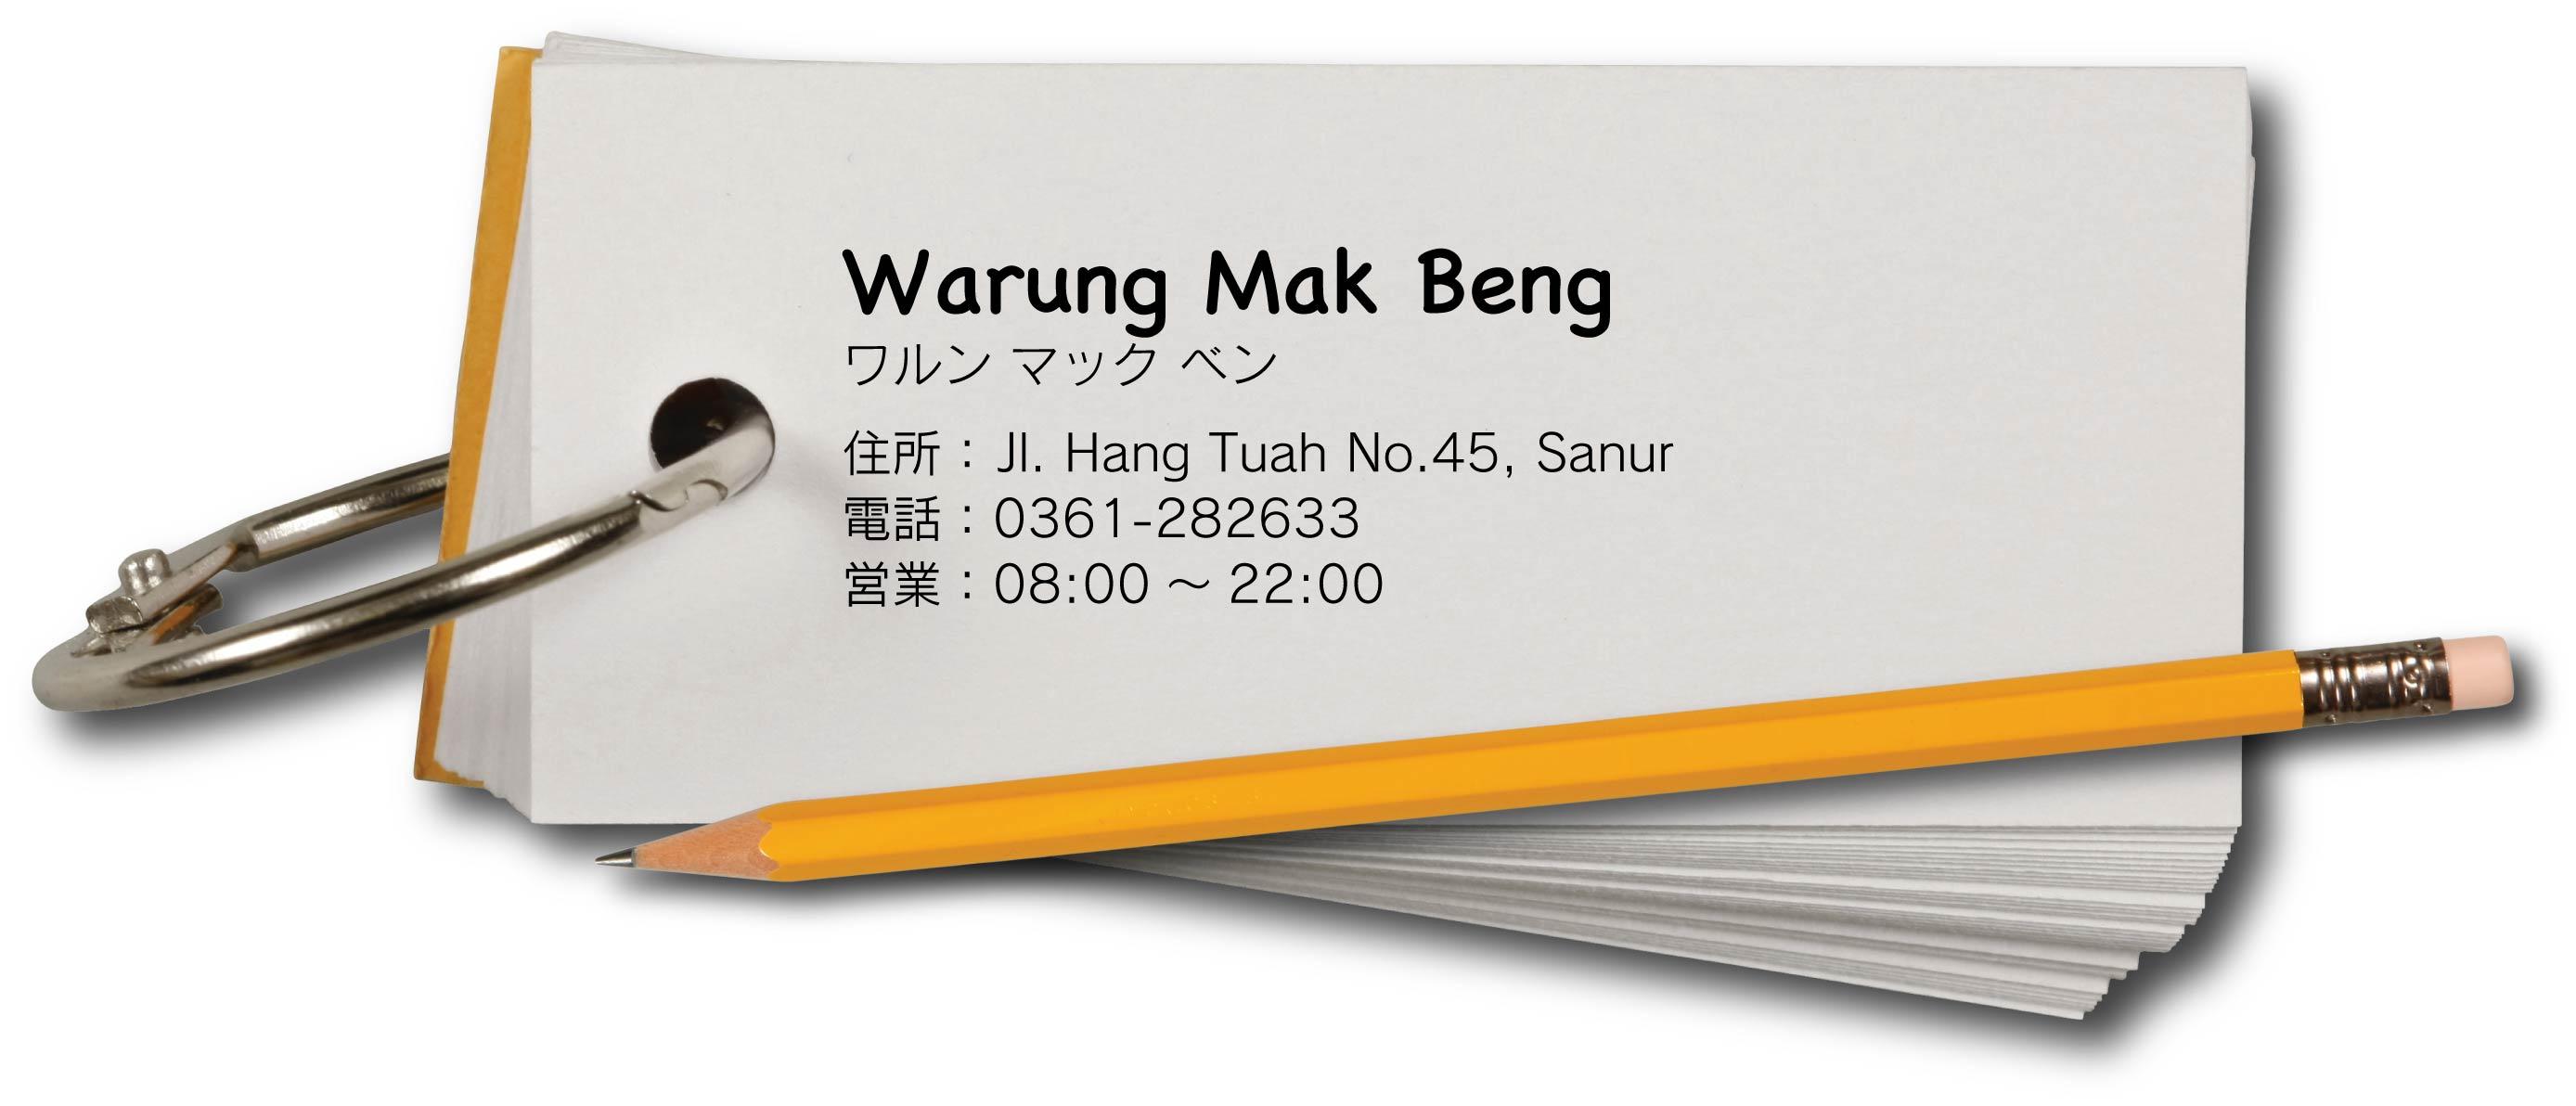 Warung Mak Bengの画像11